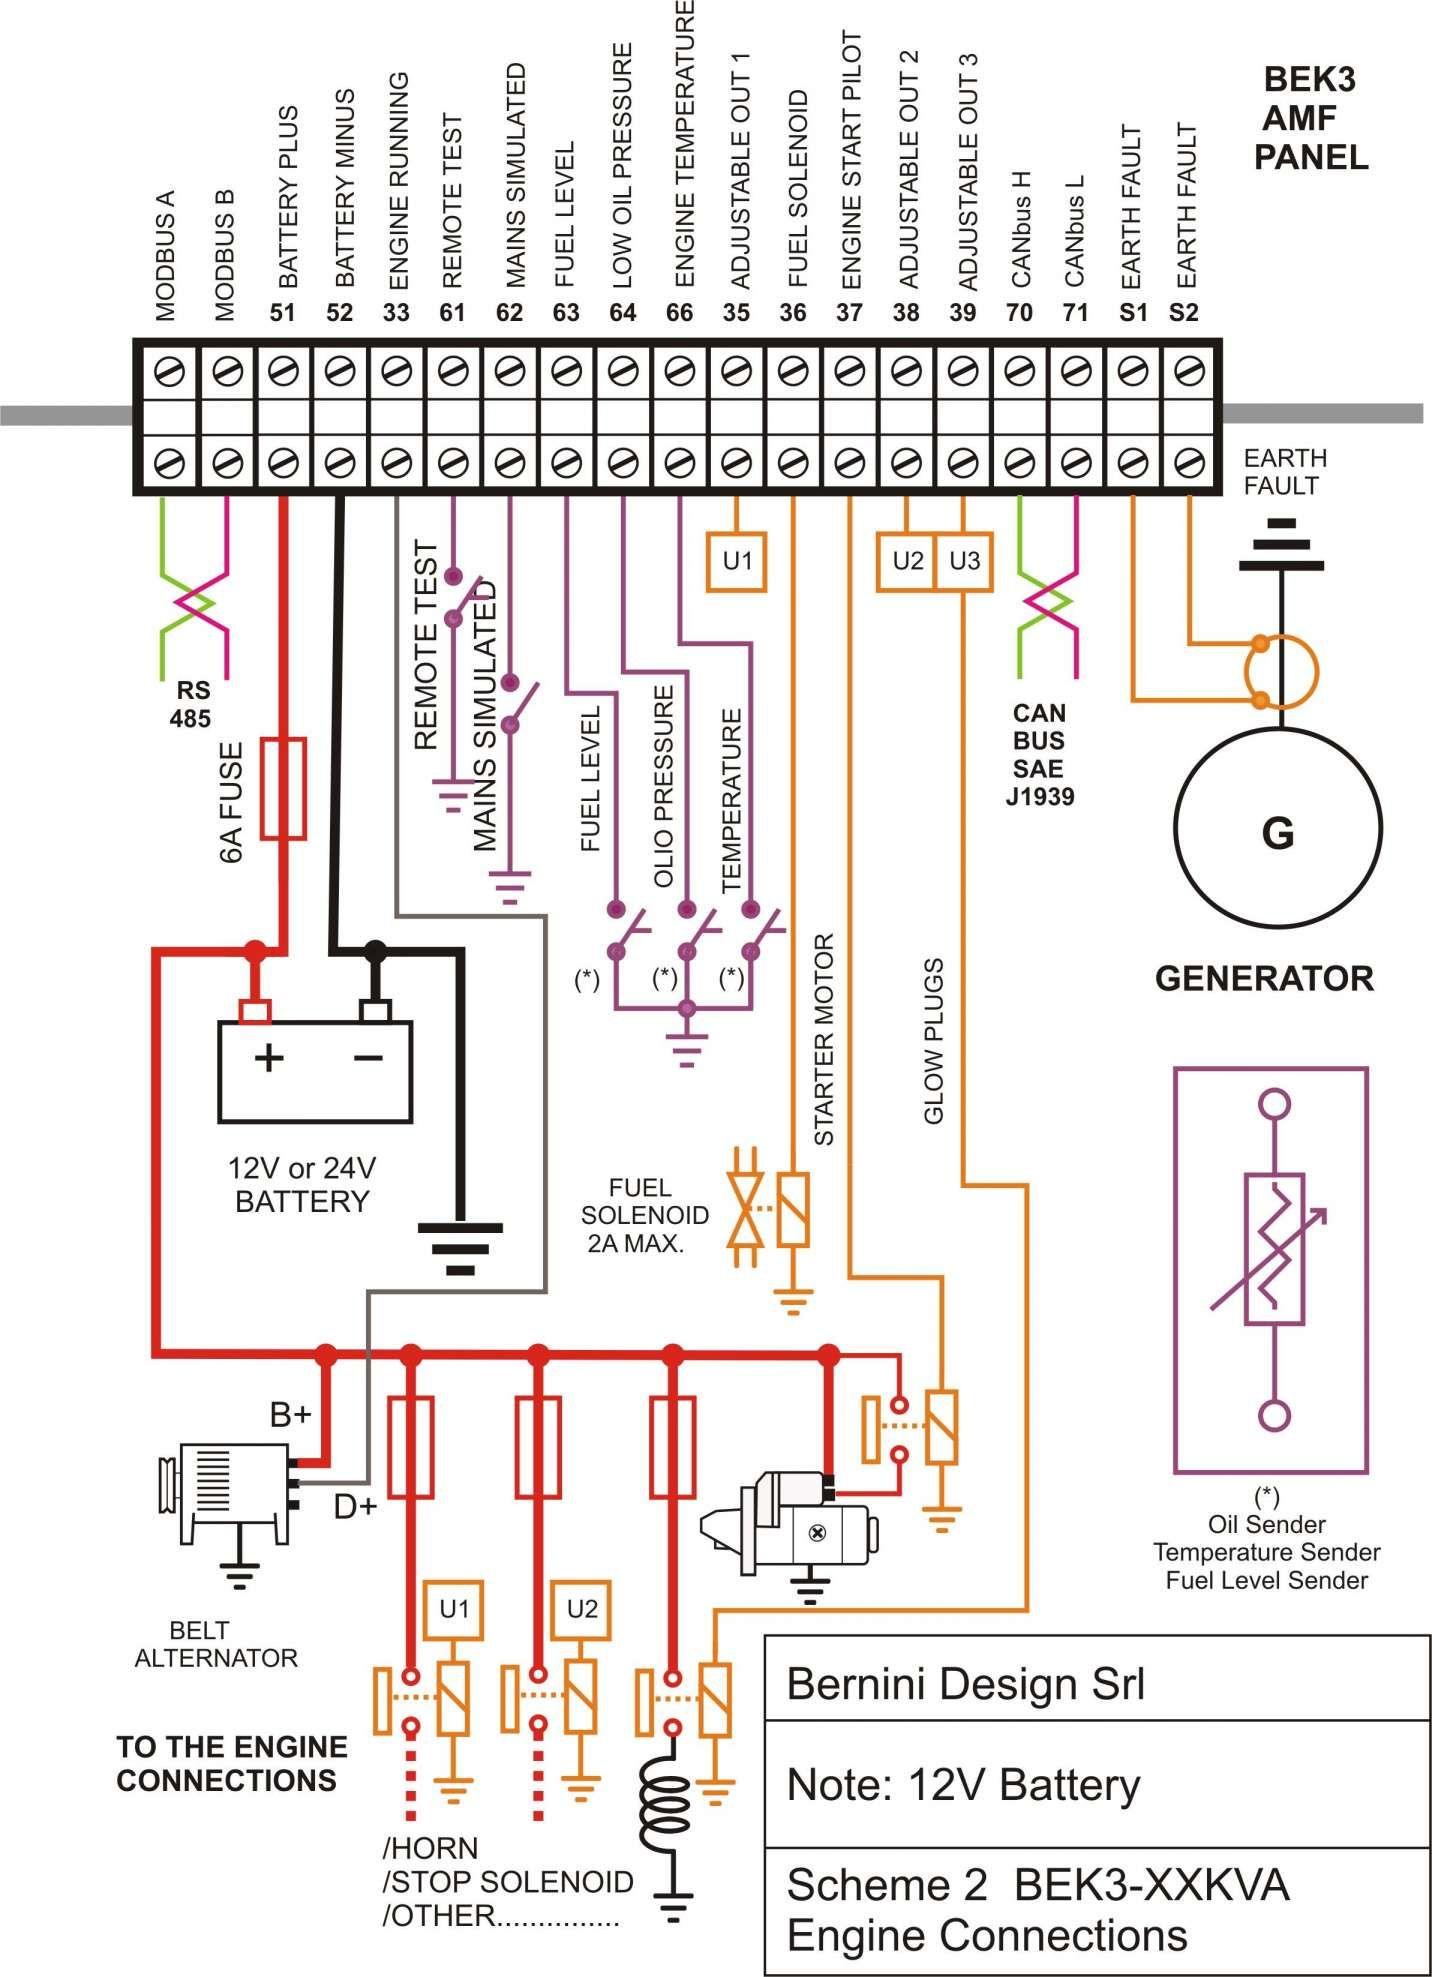 18 Diesel Engine Control Panel Wiring Diagram Engine Diagram Wiringg Net Electrical Circuit Diagram Electrical Wiring Diagram Circuit Diagram